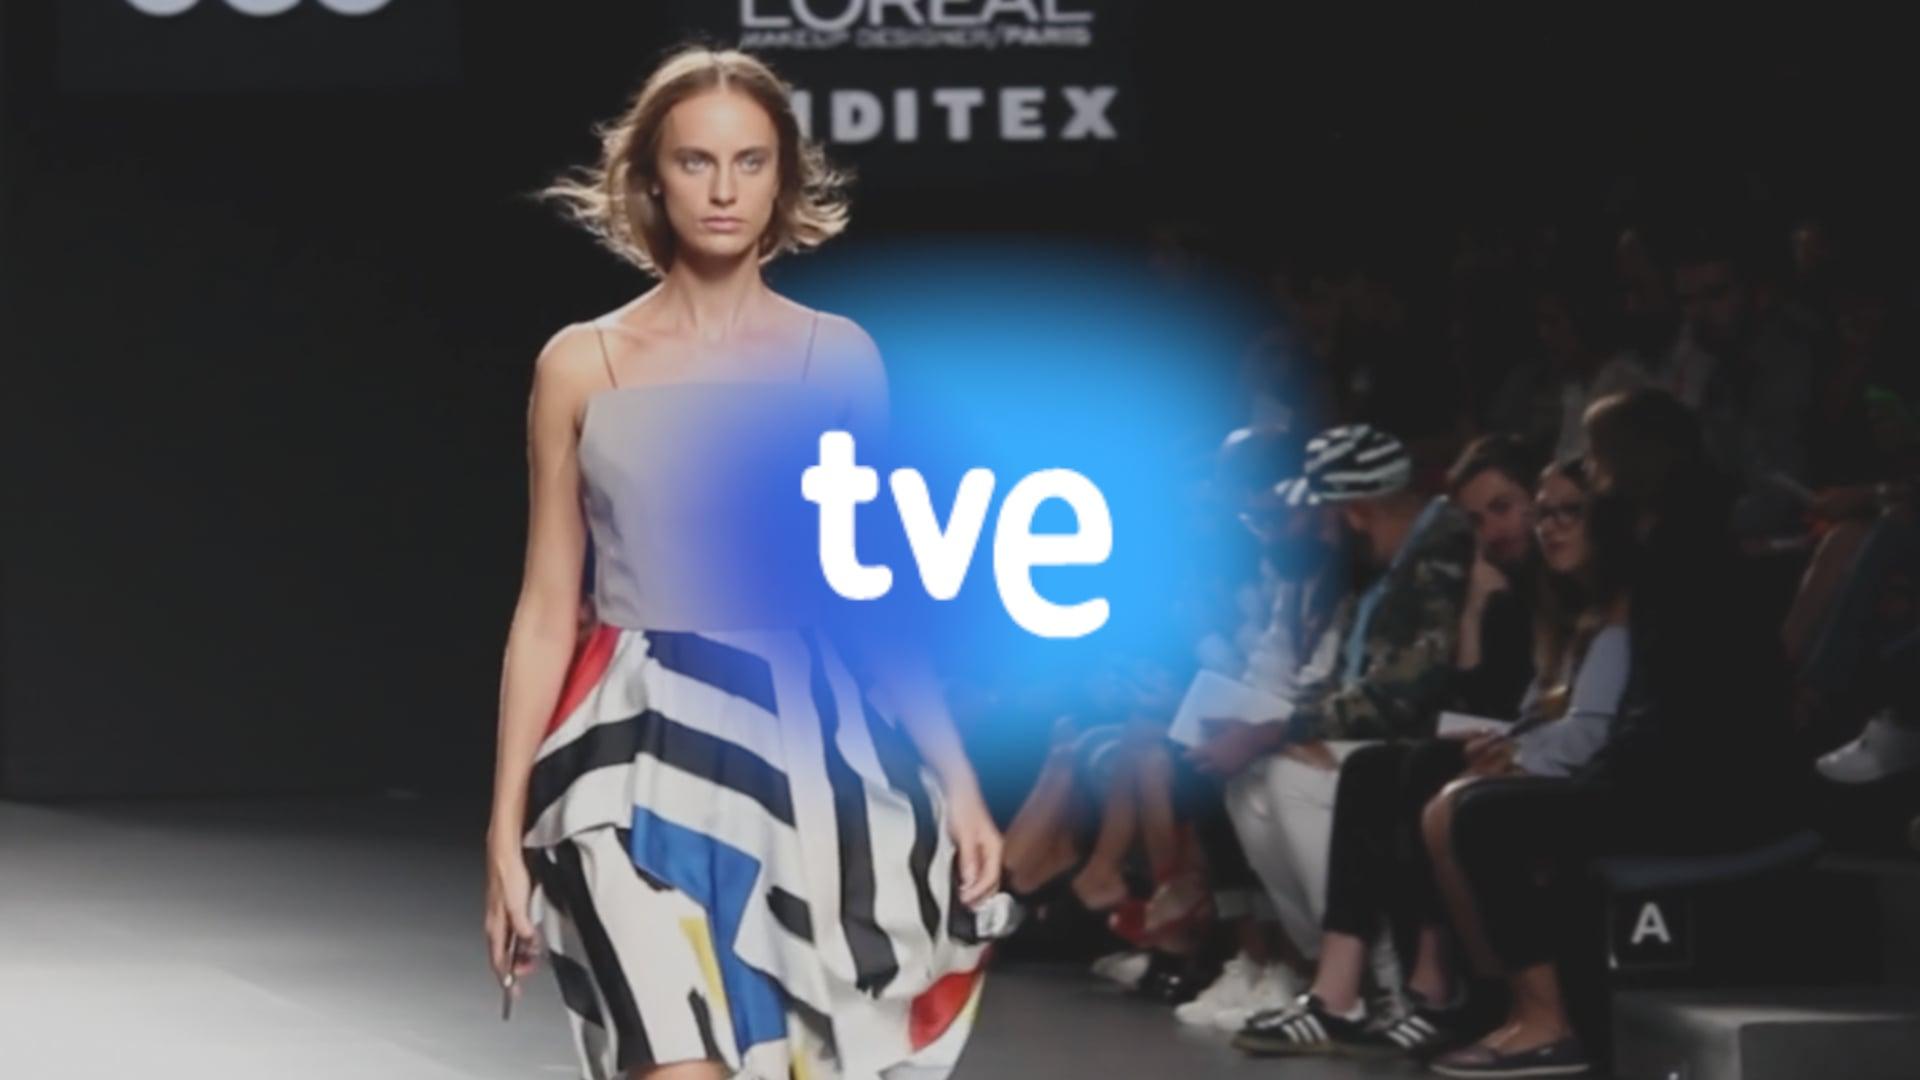 TVE - Vídeo de Leire Garmendia